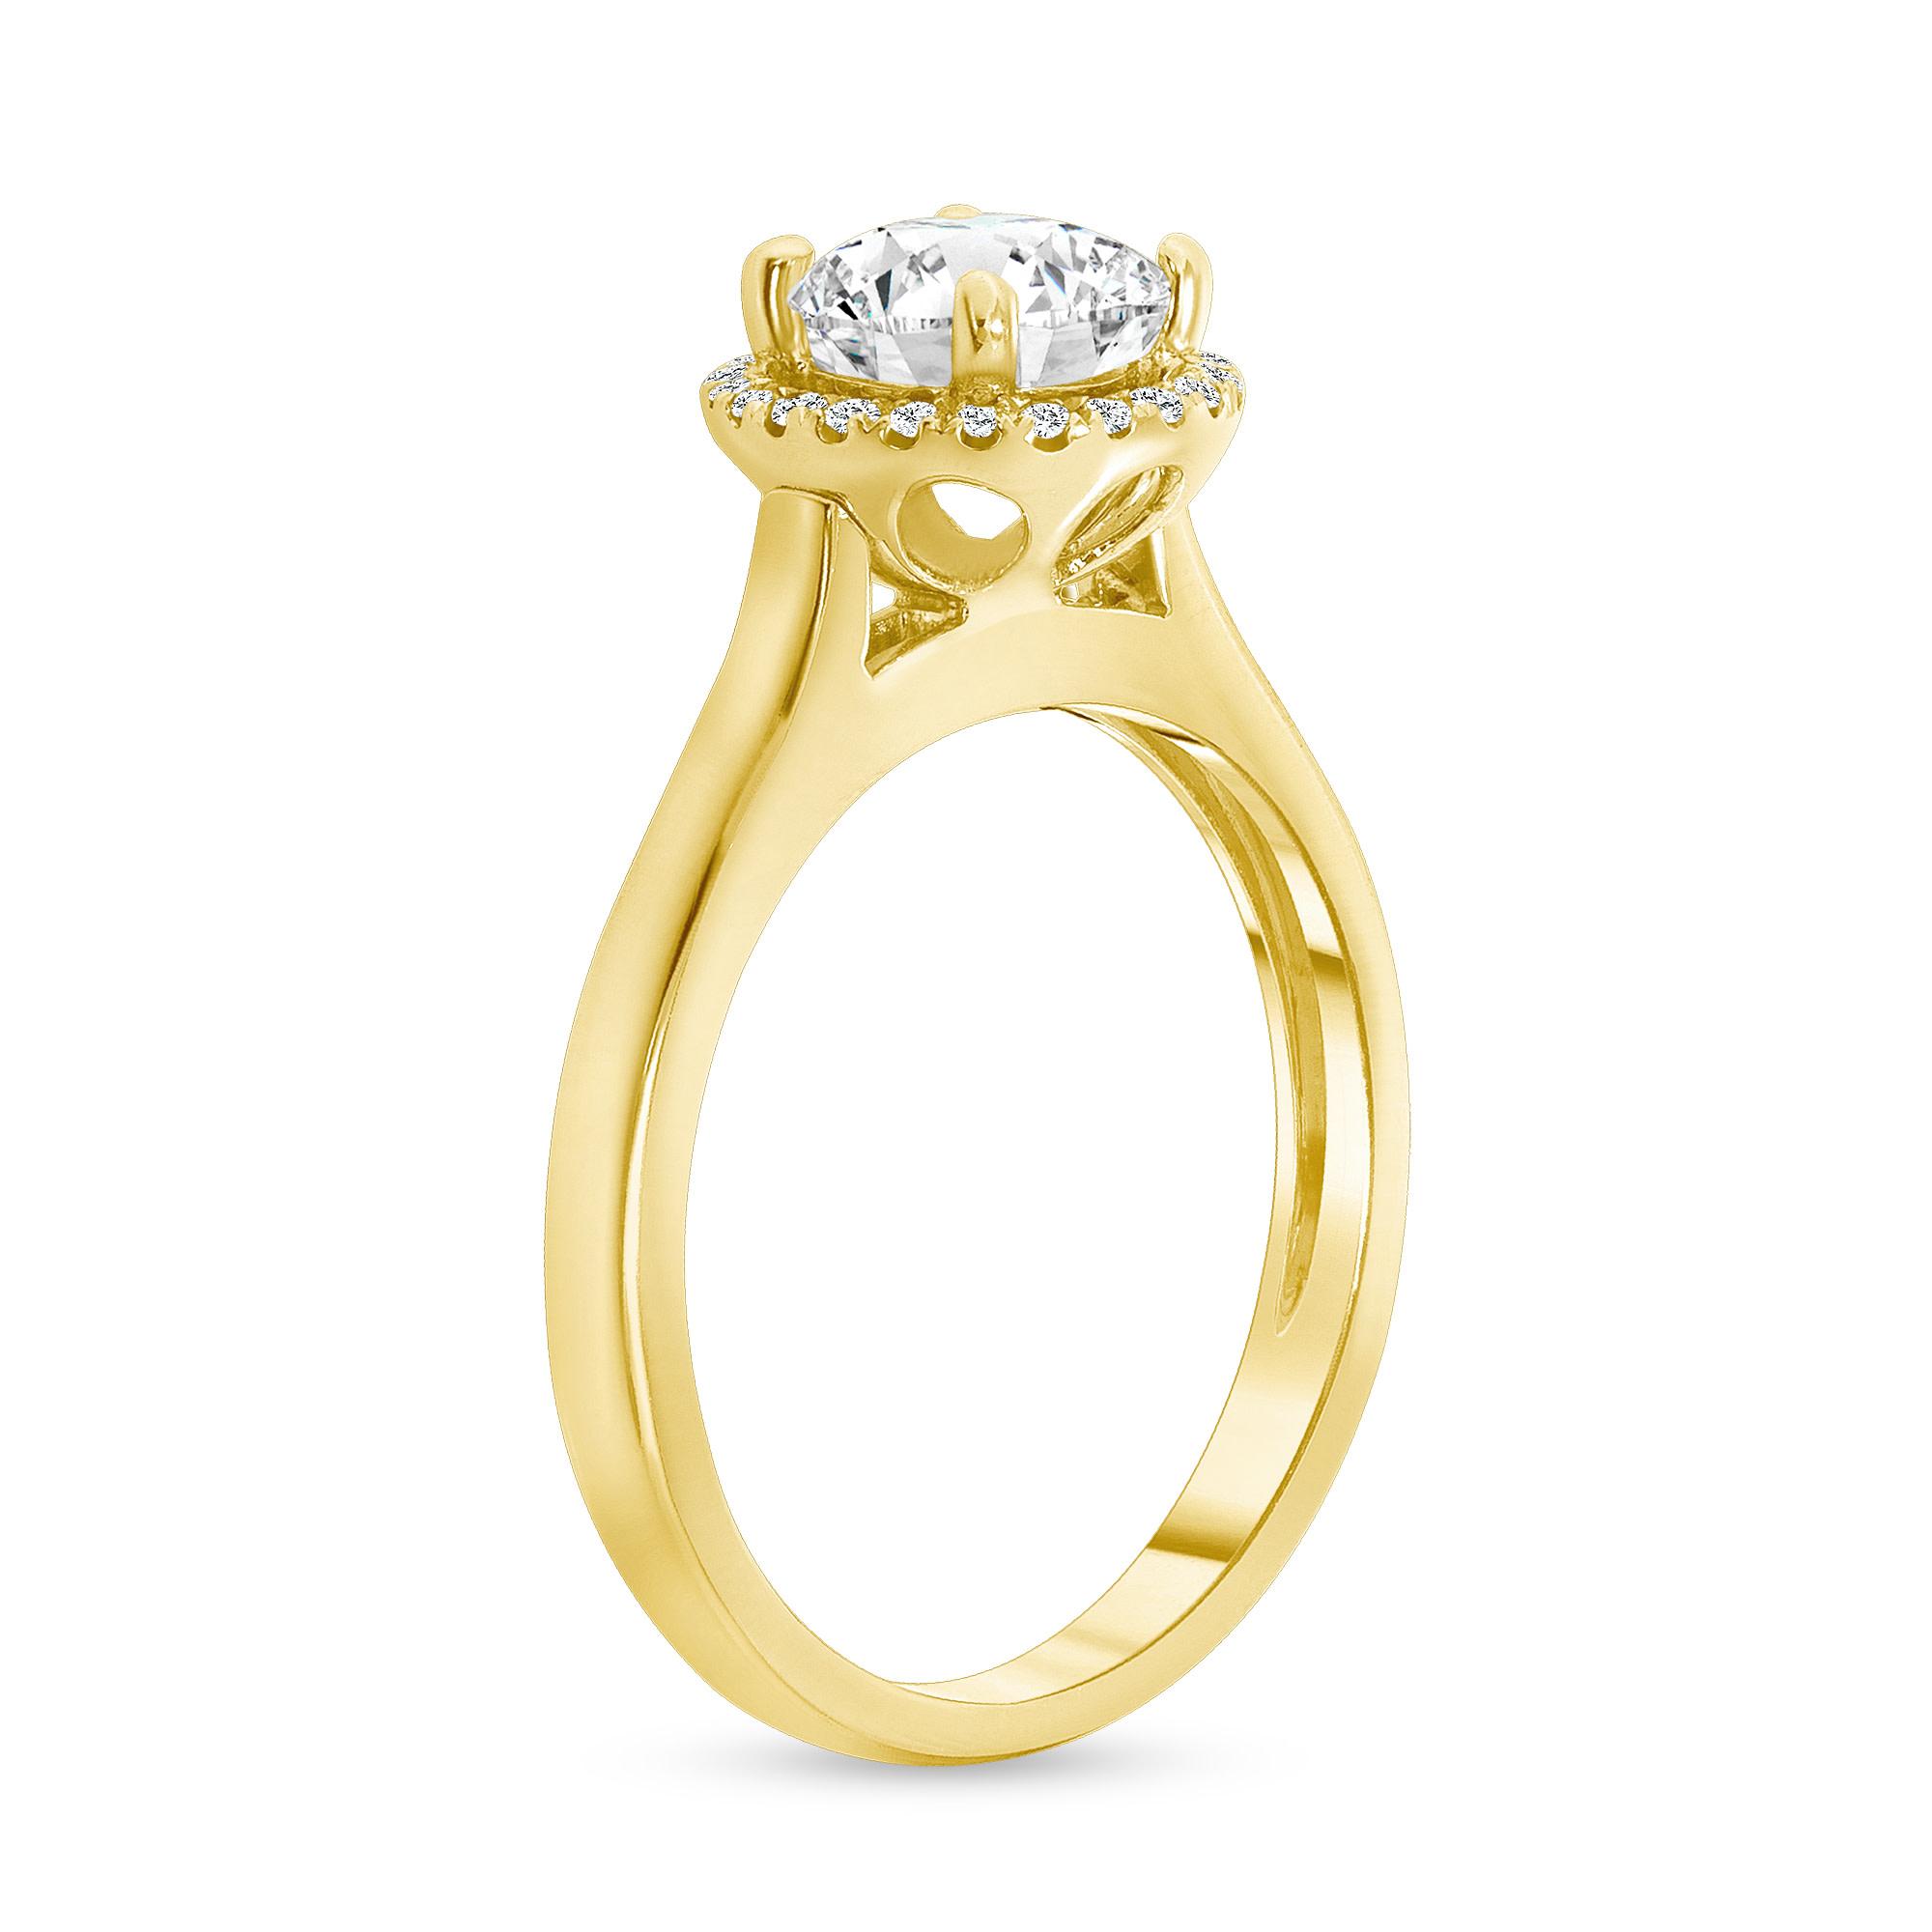 14k diamond engagement ring  | 1 ct diamond engagement ring 14k white gold